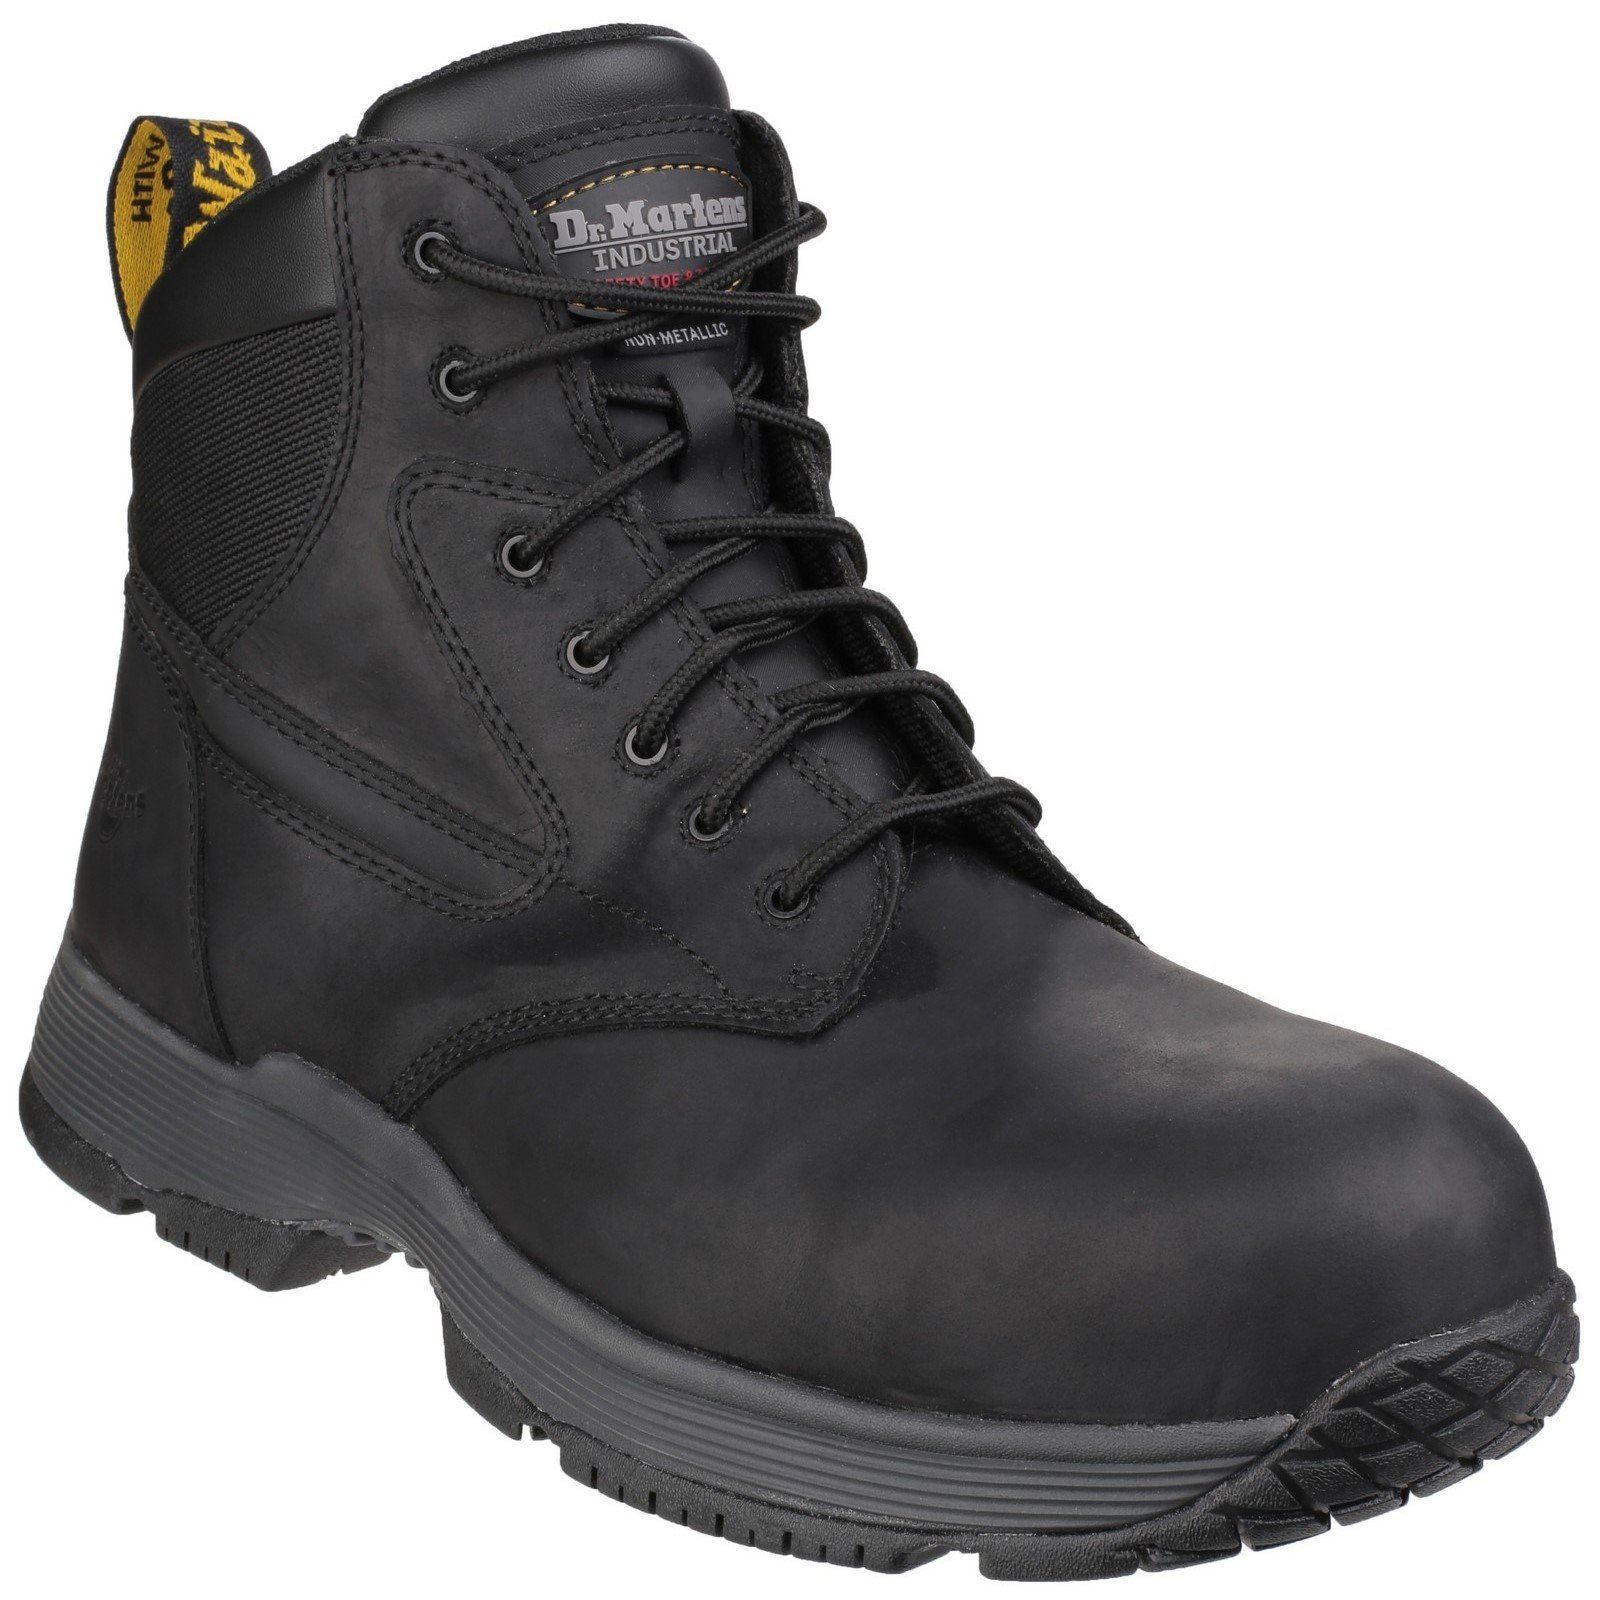 Dr Martens Unisex Corvid Composite Lace up Safety Boot Black 24862-41125 - Black 9